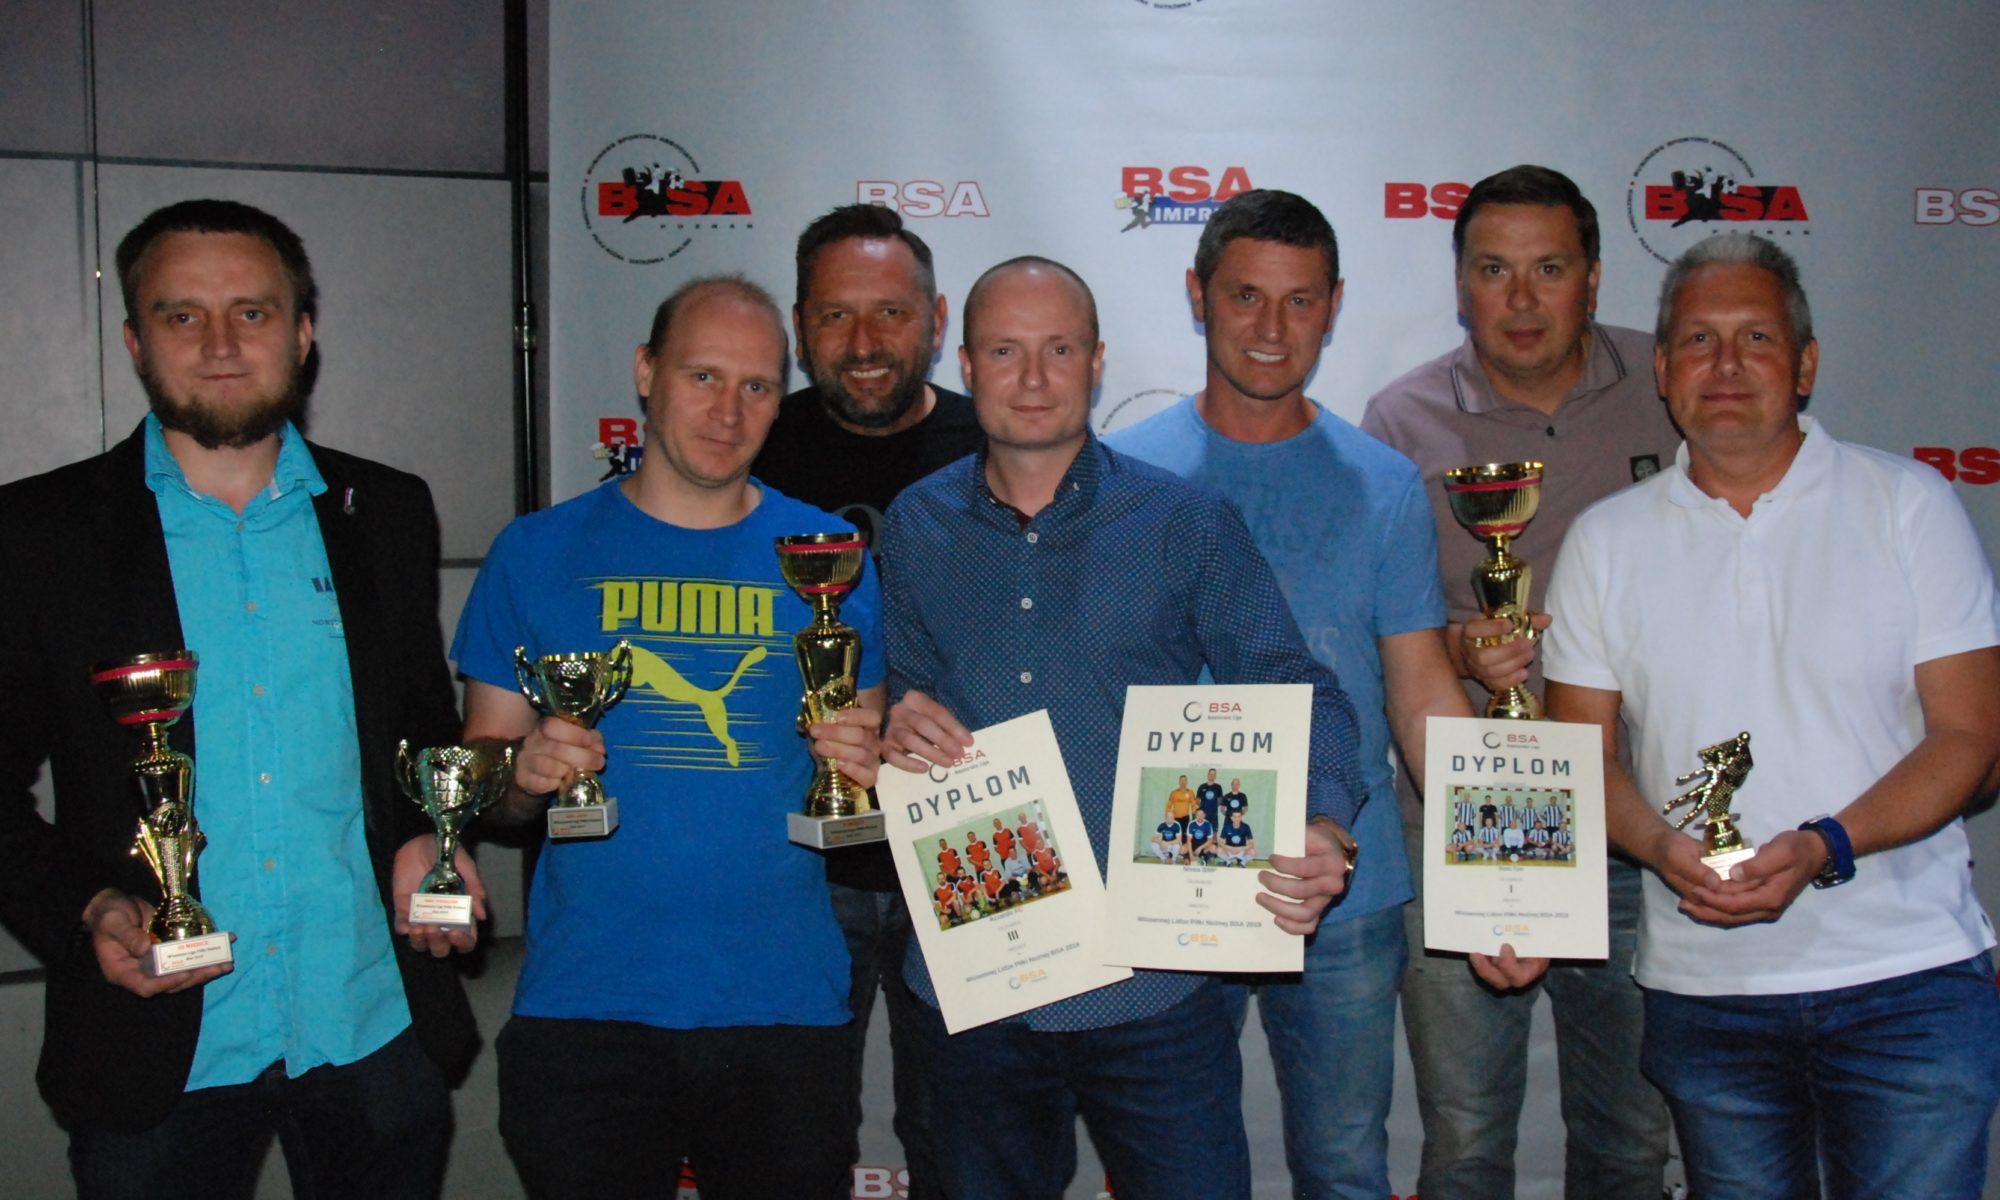 Podsumowanie Wiosennej Bowling Ligi BSA 2019